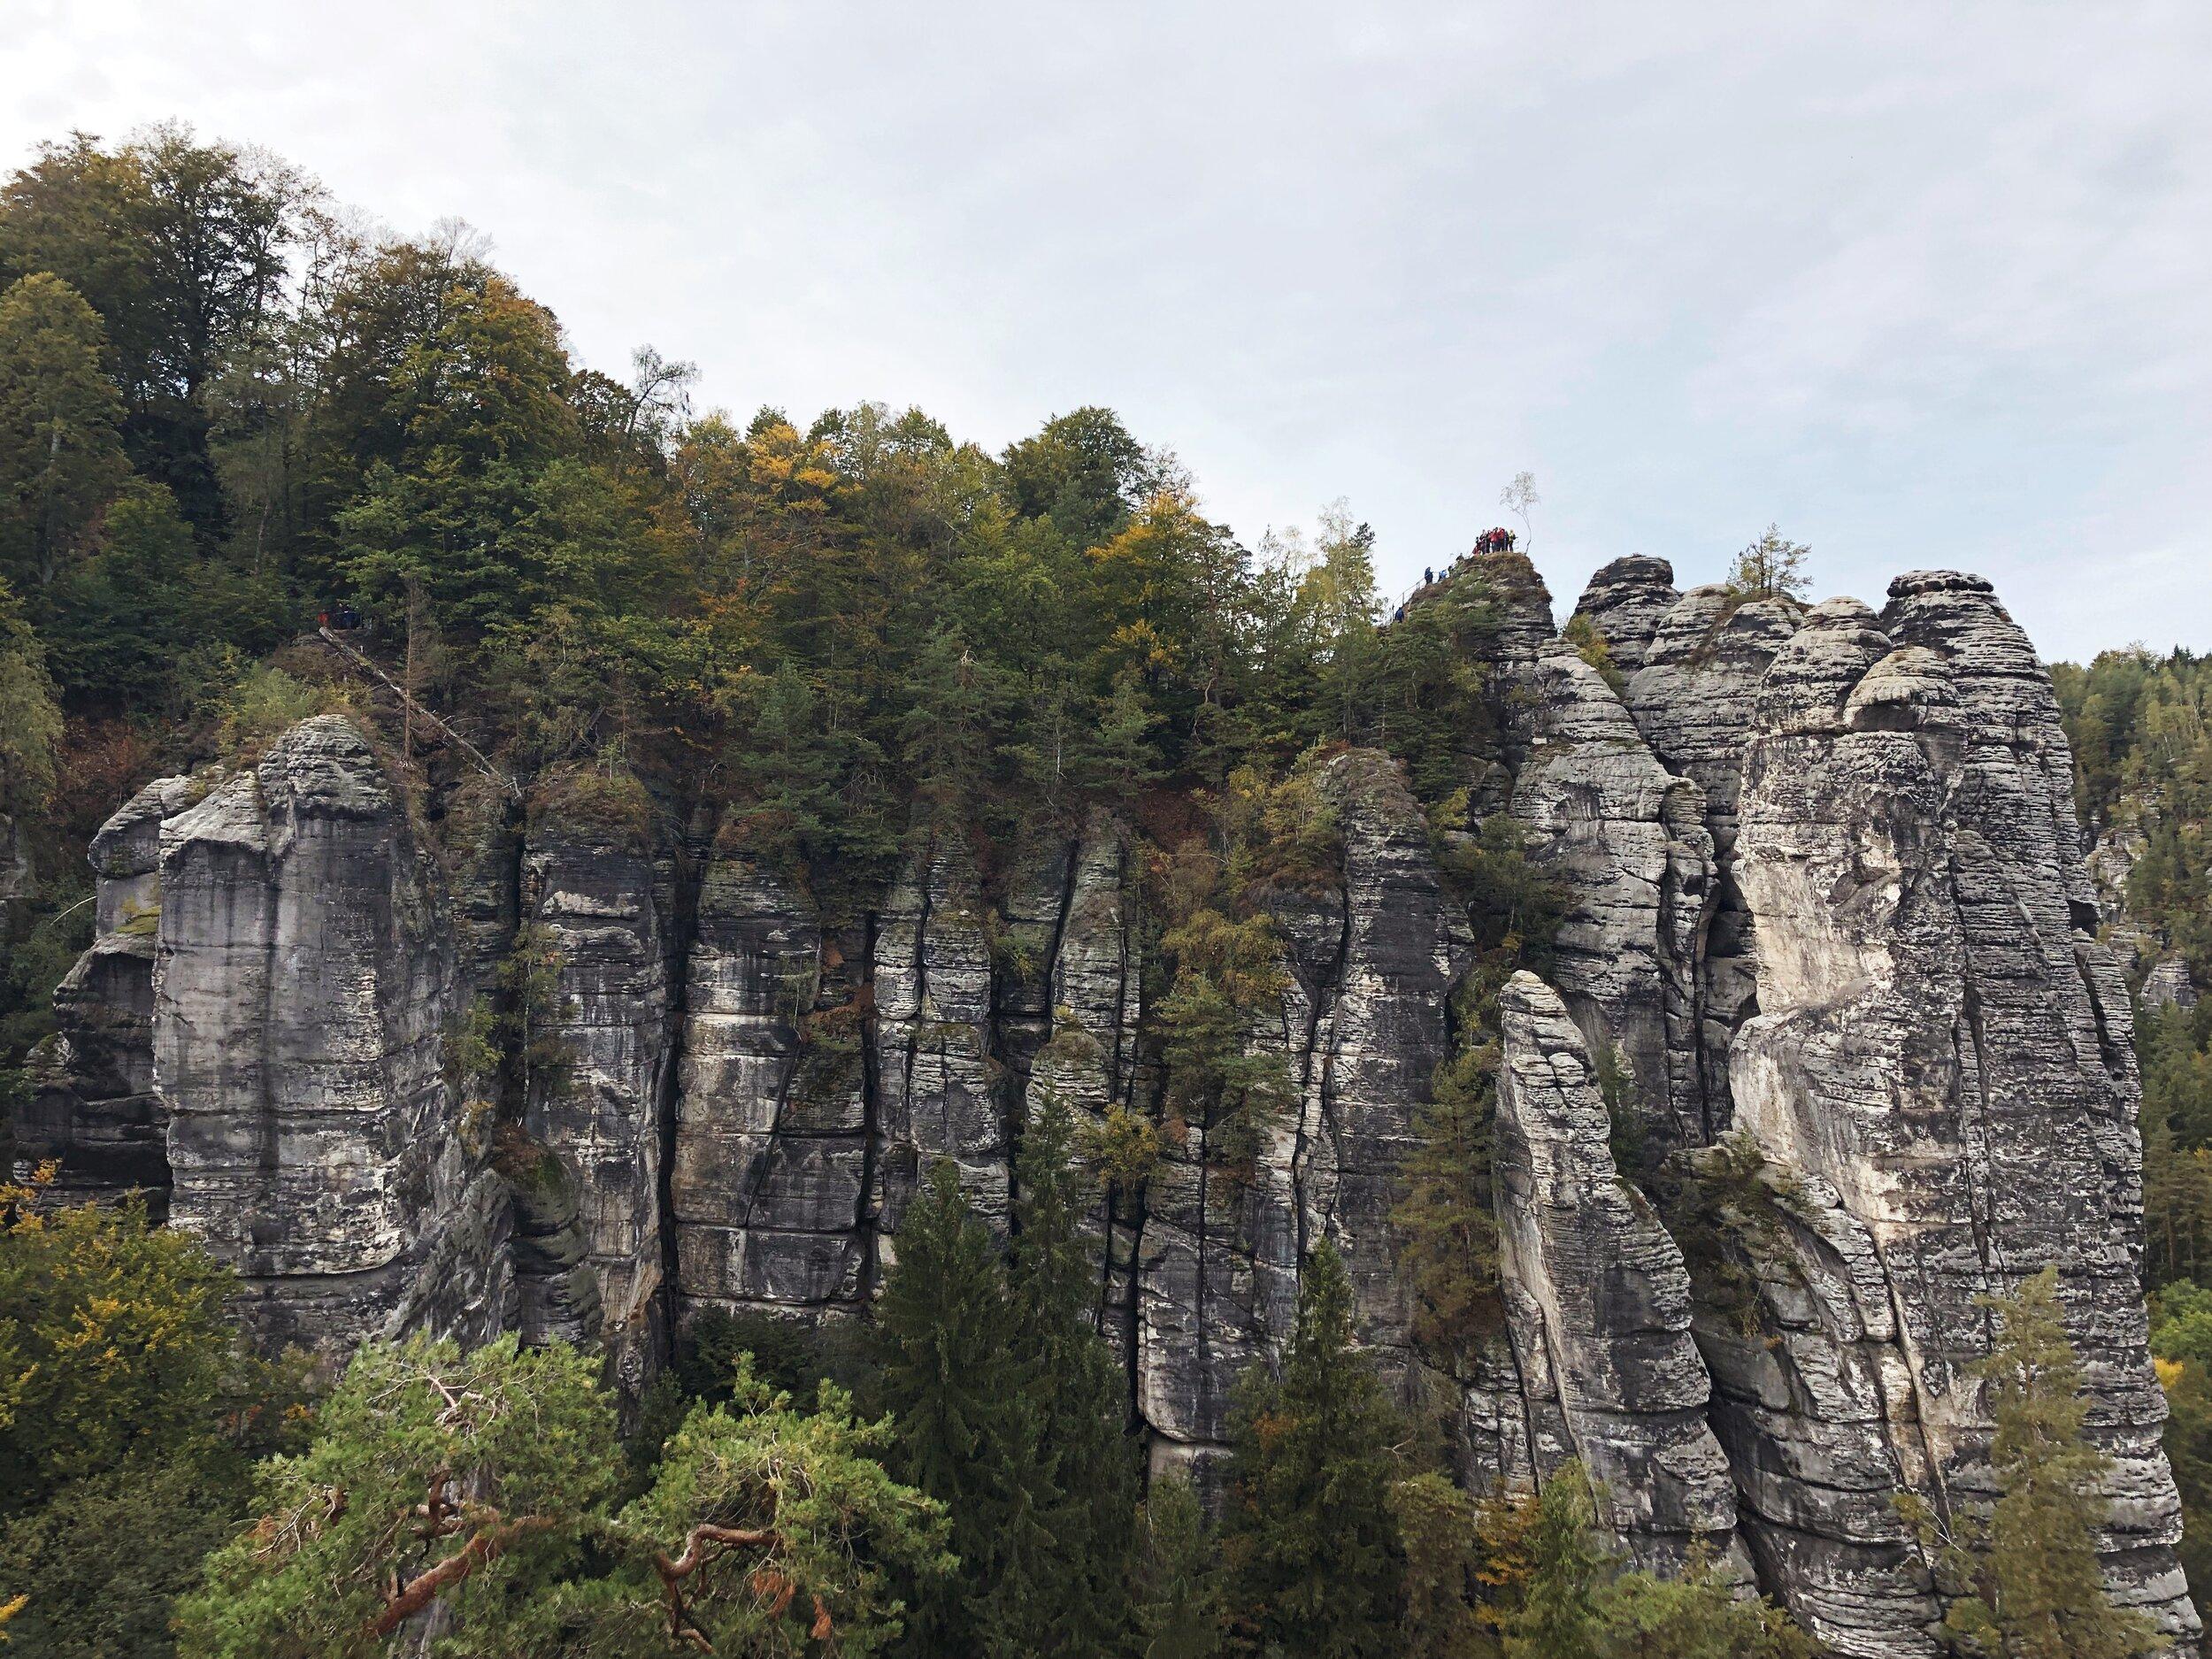 baste-bridge-lohmen-germany-hiking_0321.JPG